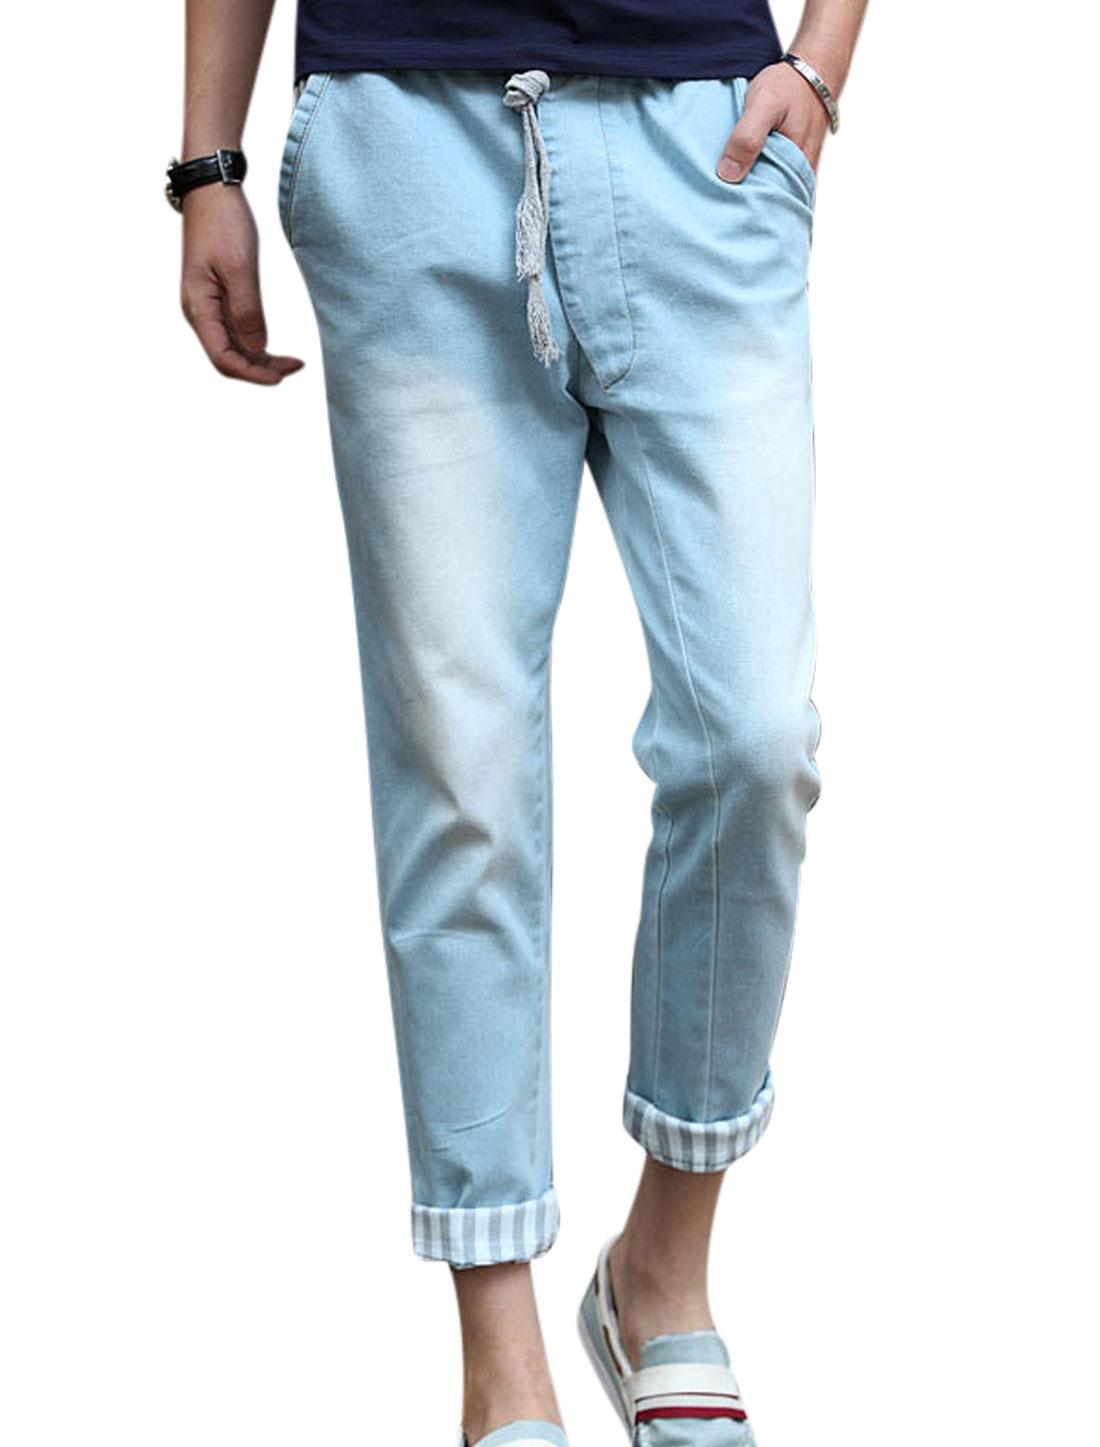 Men Elastic Drawstring Waist Mid Rise Washed Denim Cropped Jeans Light Blue W30